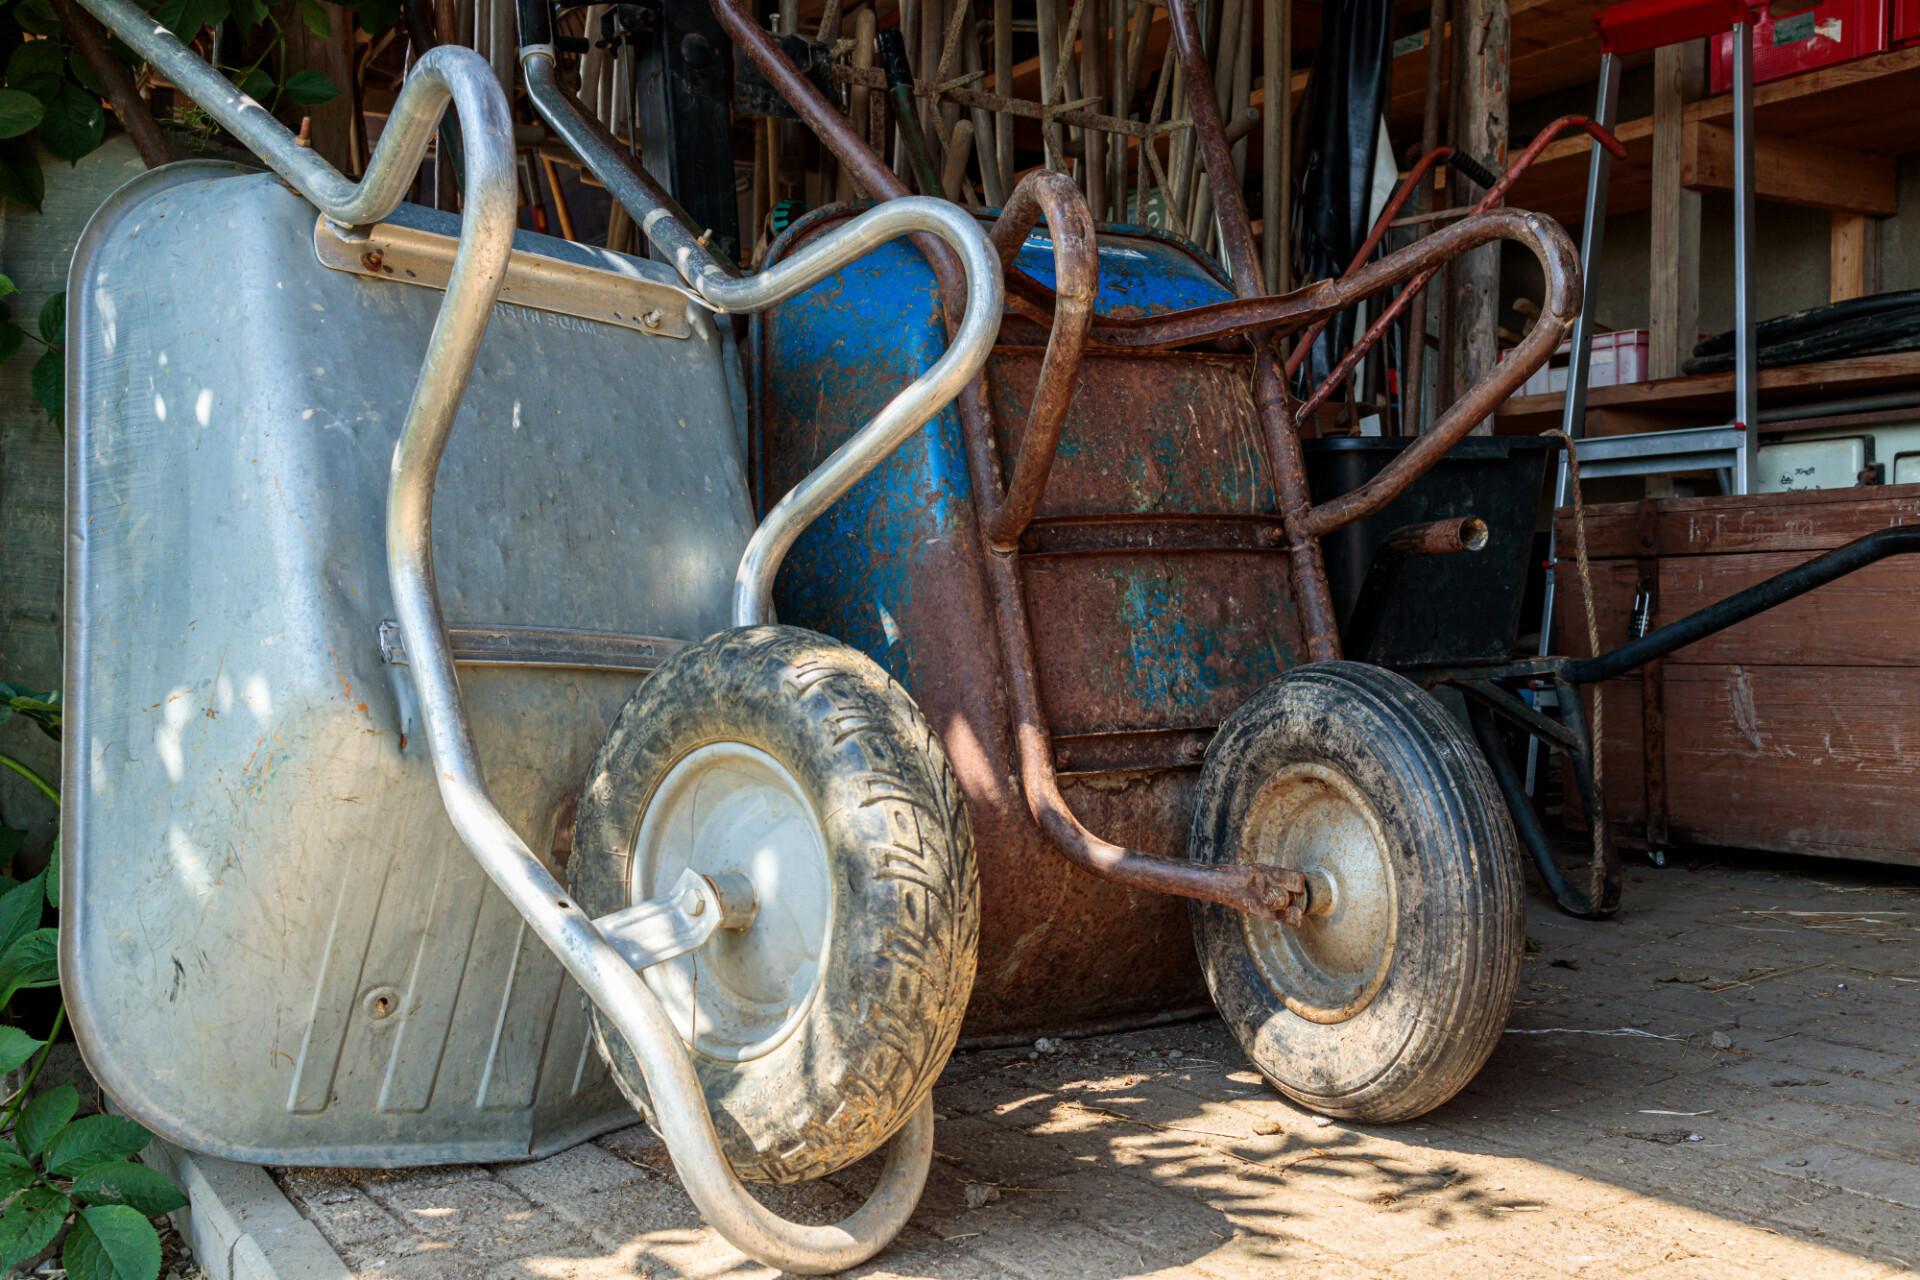 Old wheelbarrows in a barn